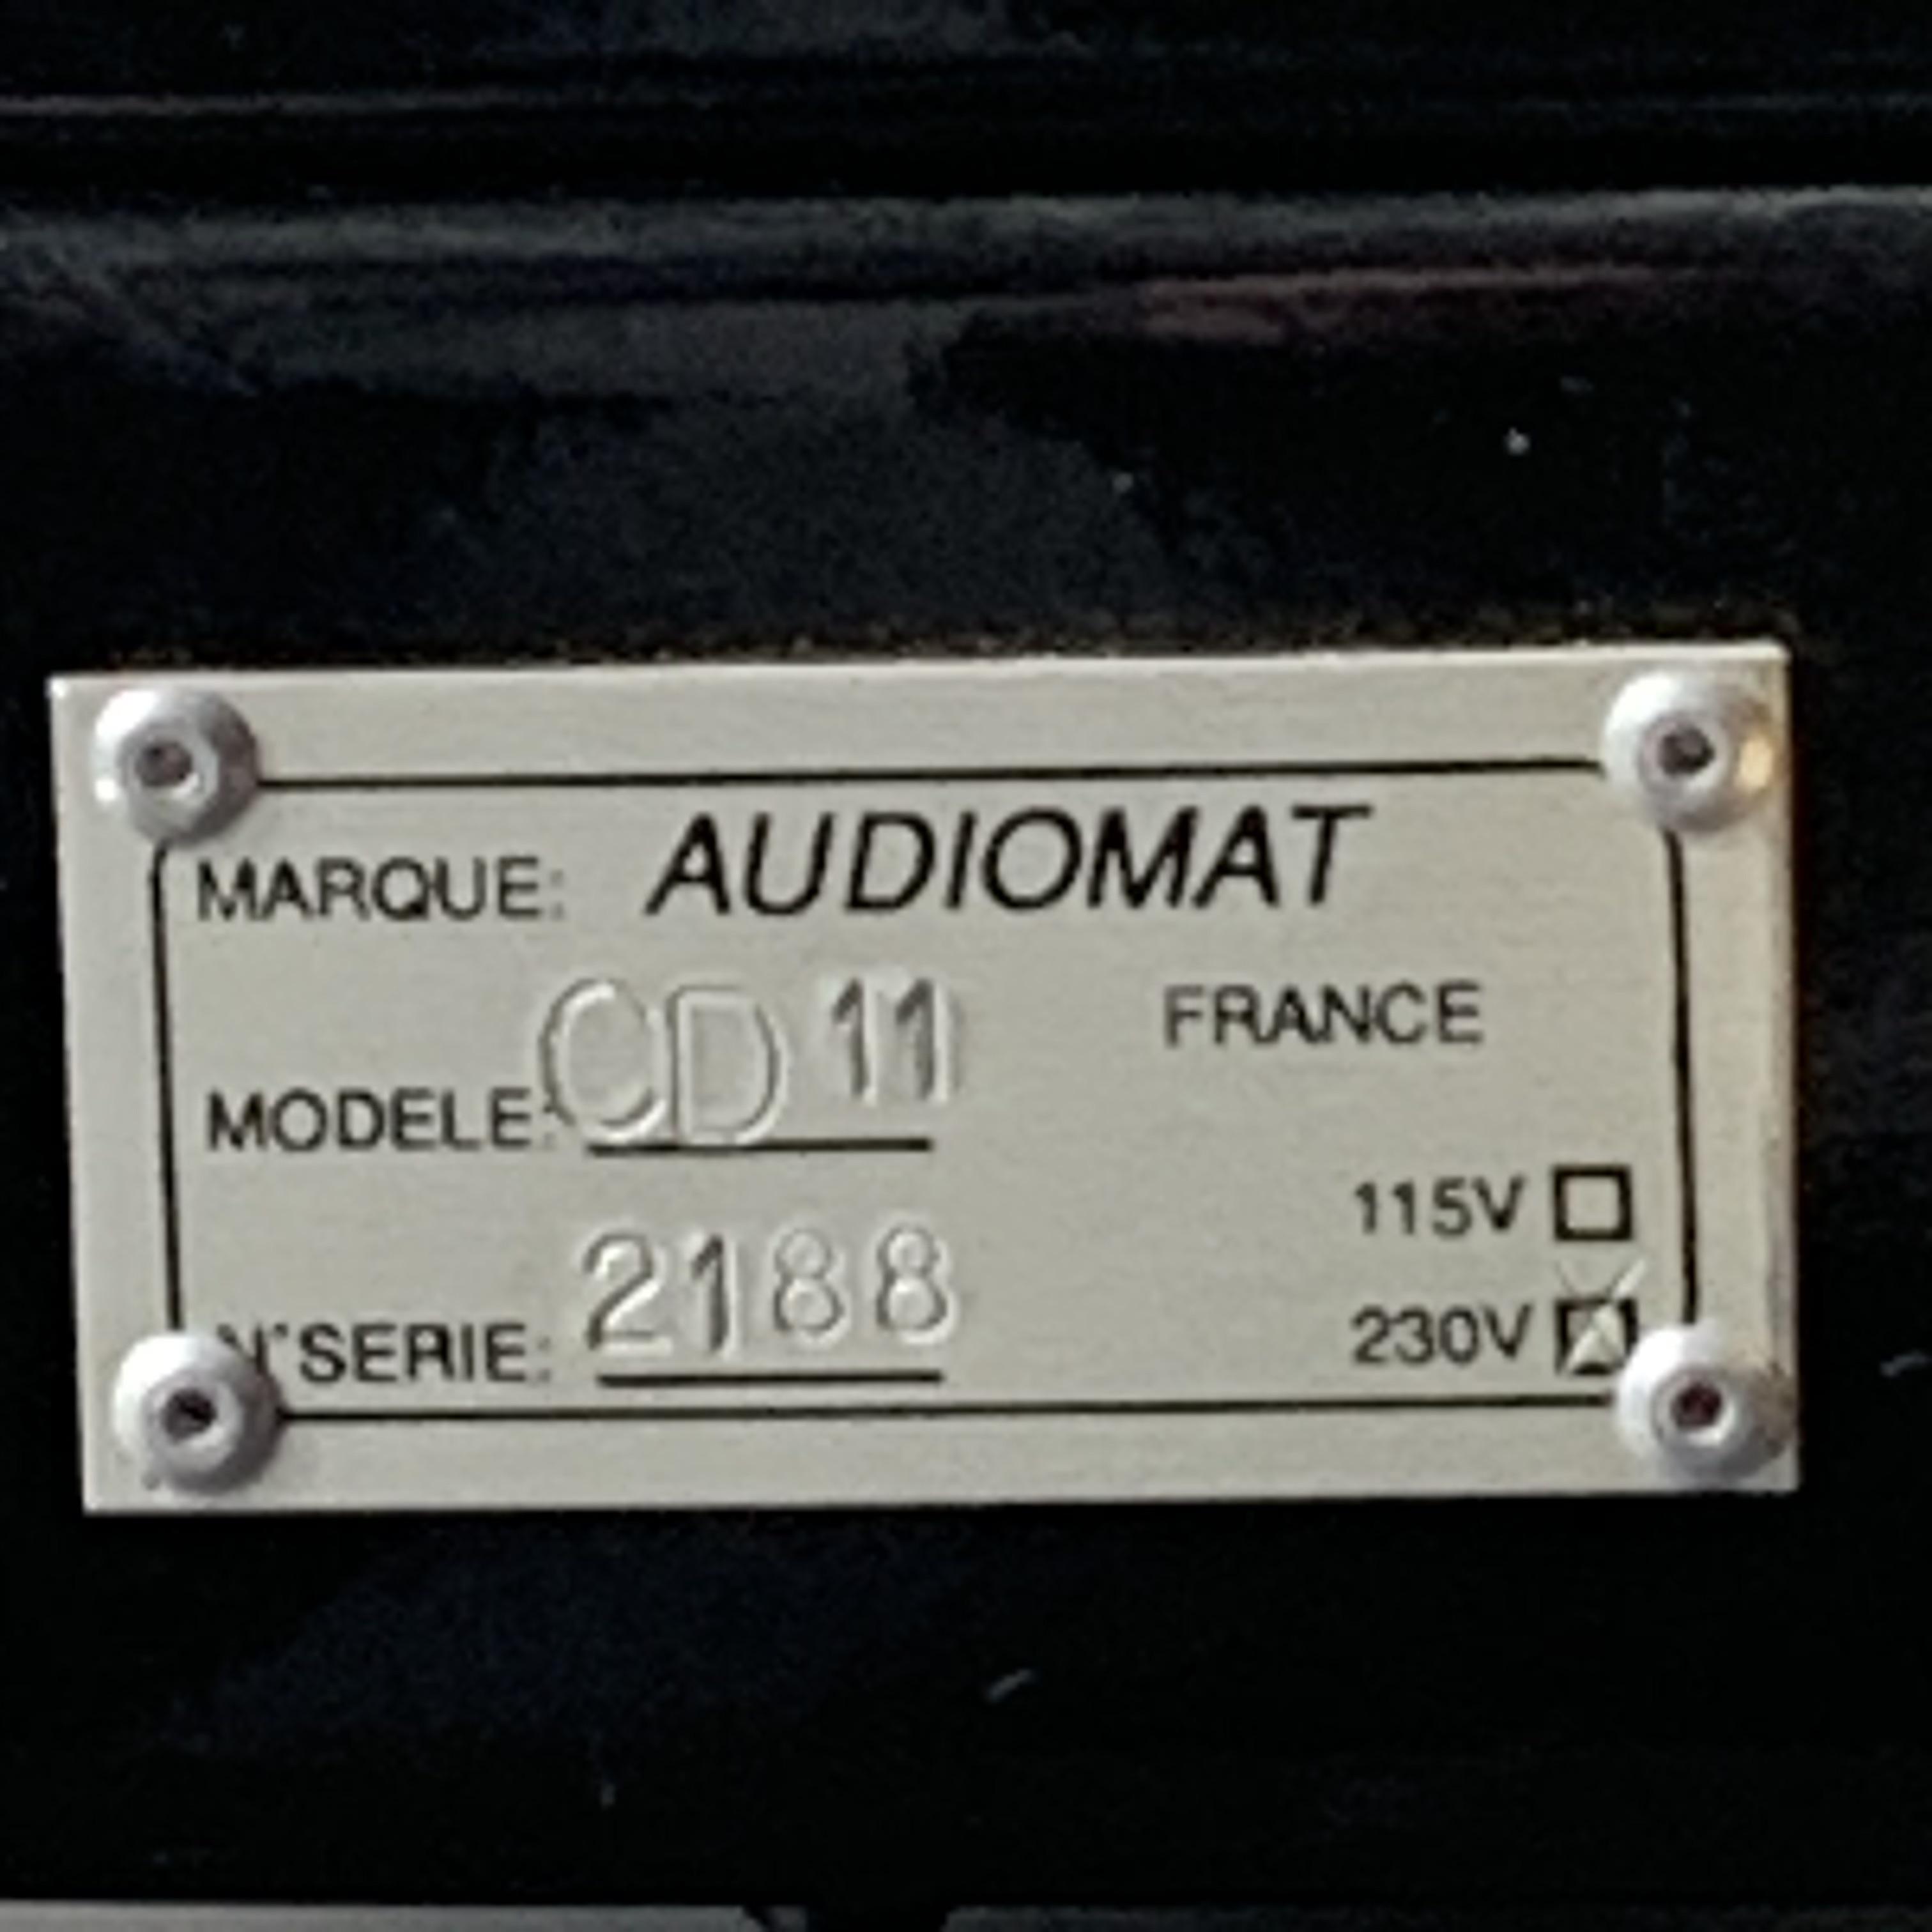 Audiomat model prelude